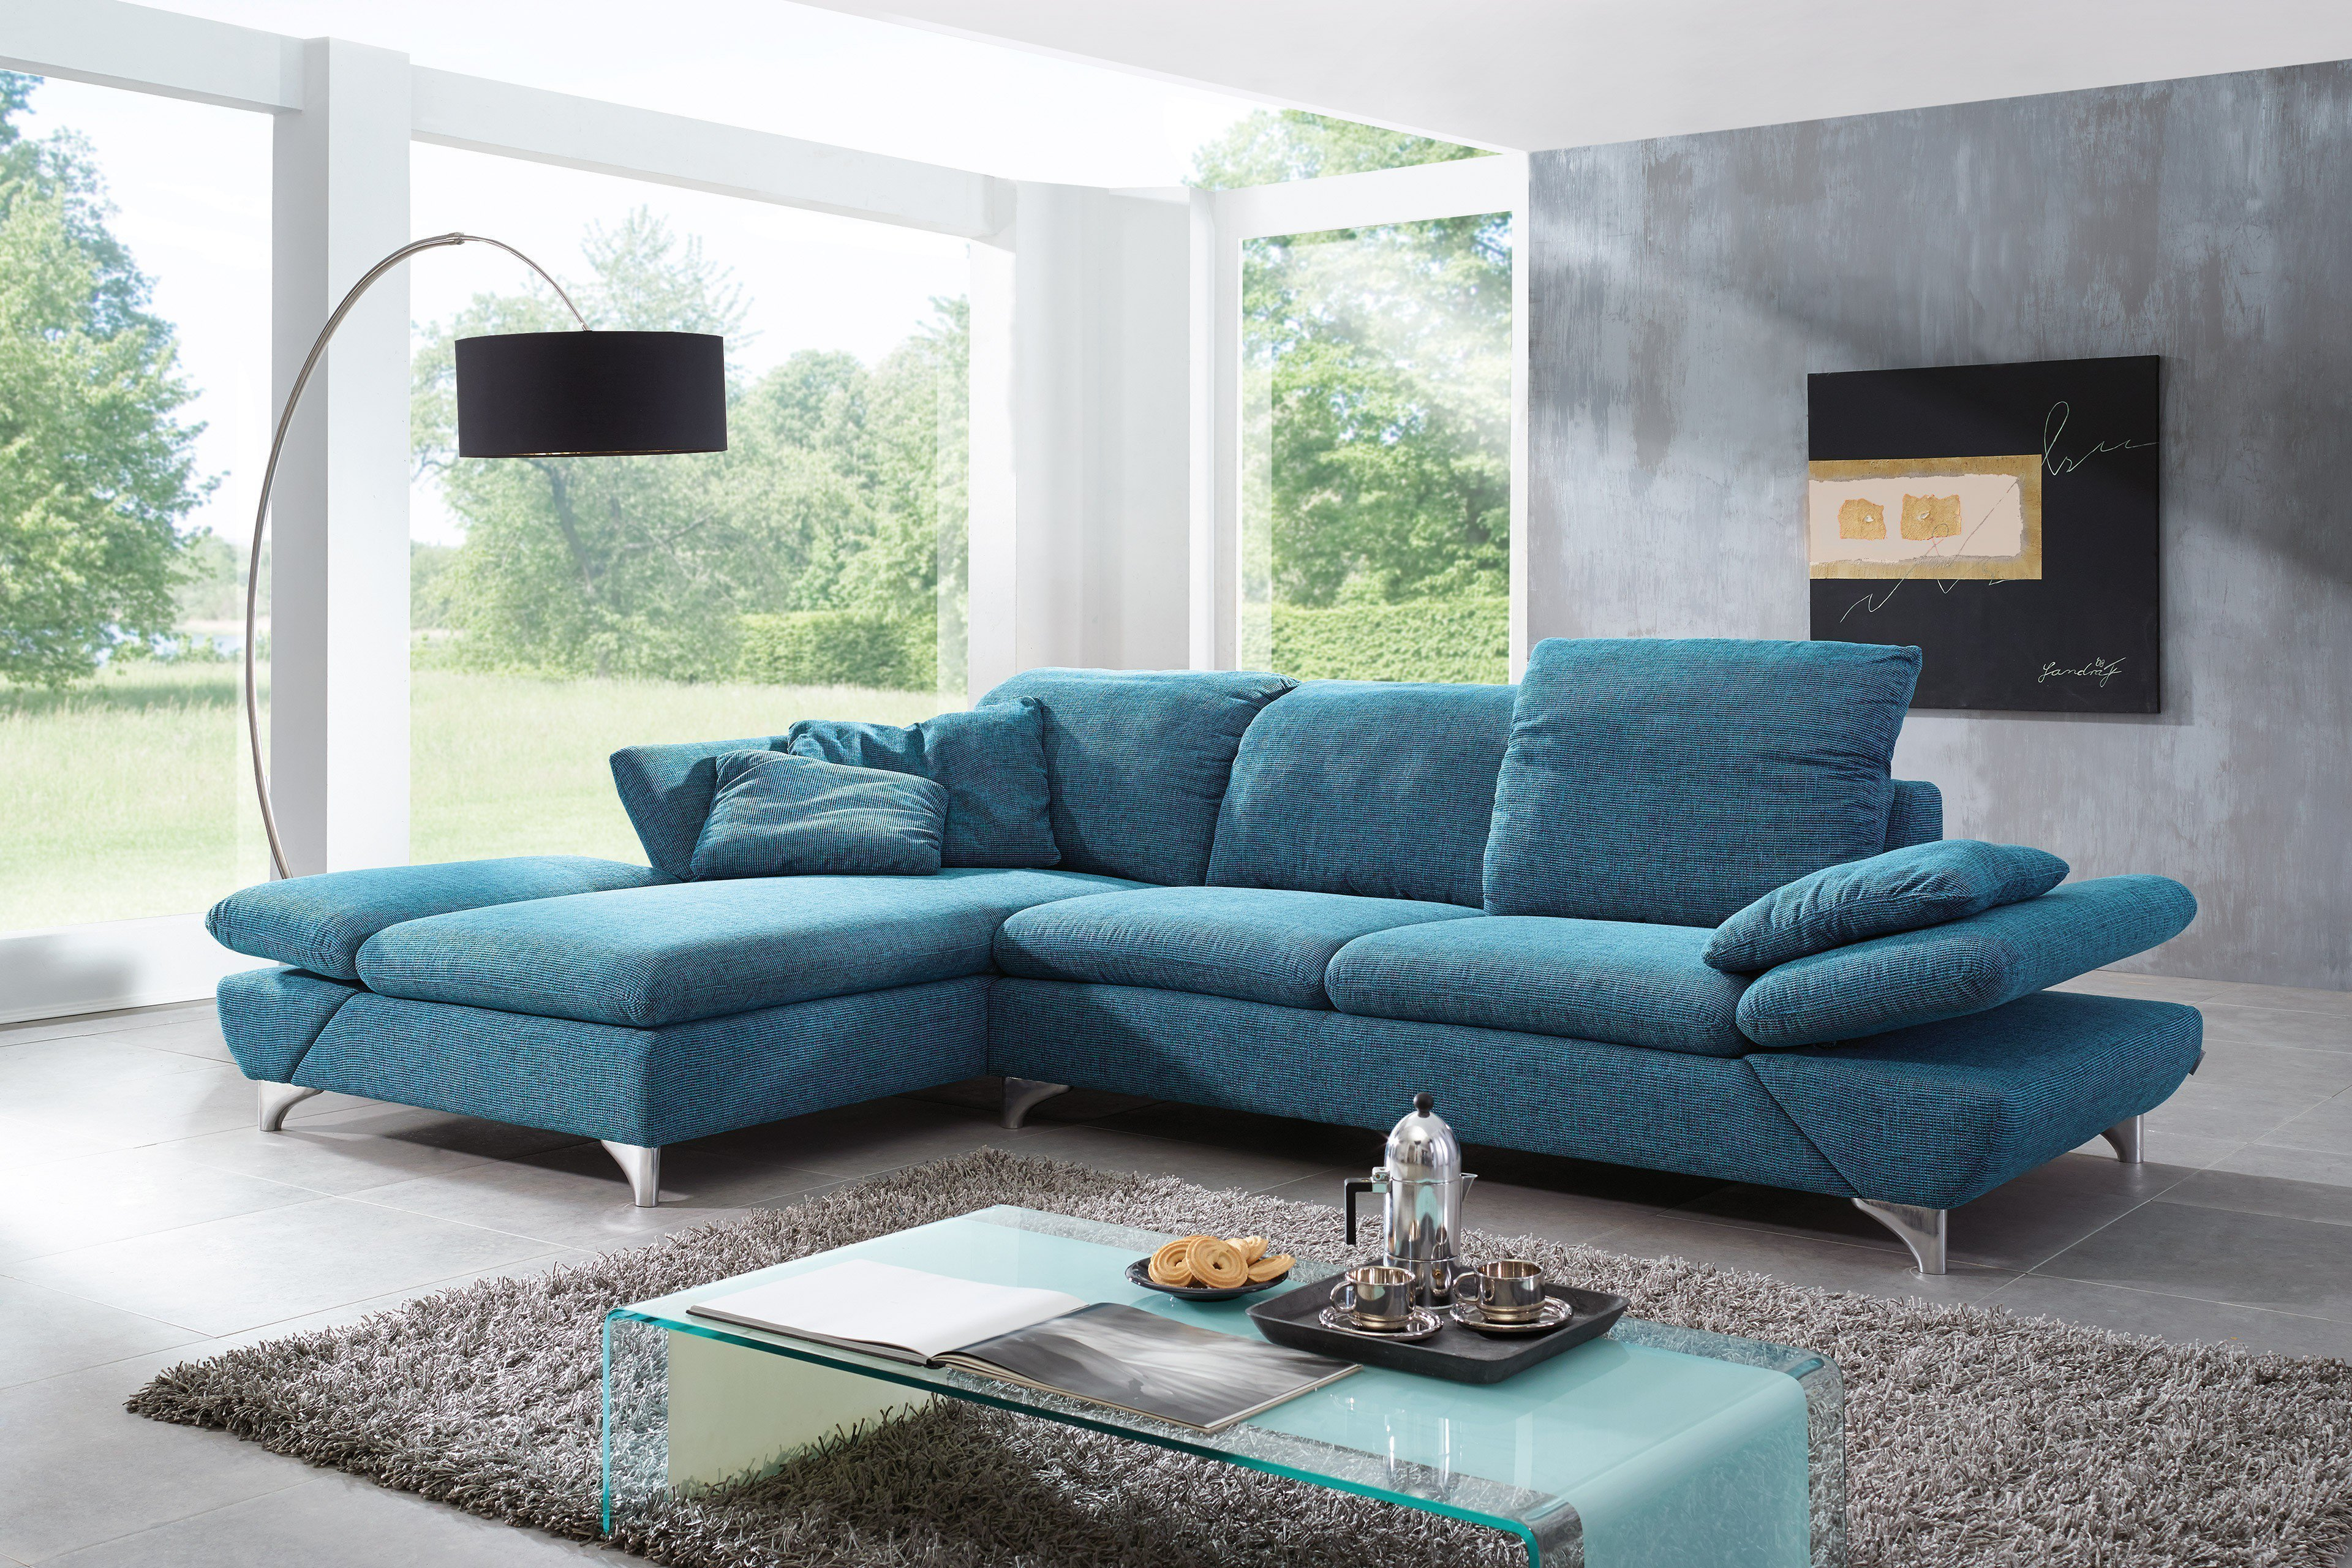 willi schillig 15278 taoo eckgarnitur petrol m bel letz ihr online shop. Black Bedroom Furniture Sets. Home Design Ideas